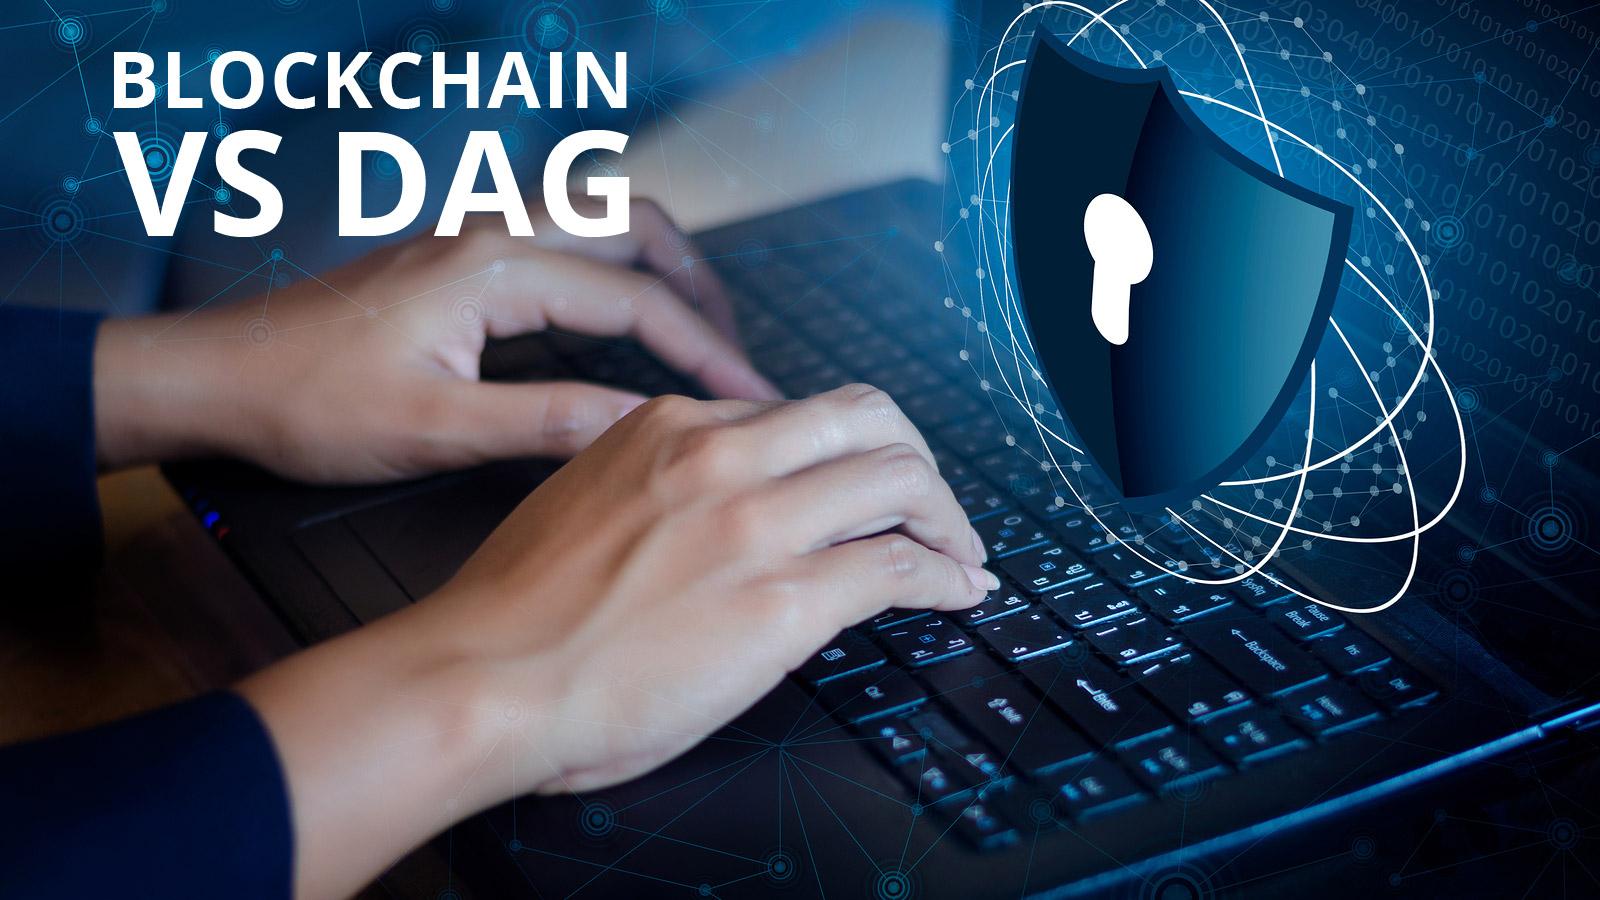 DAG chain development company